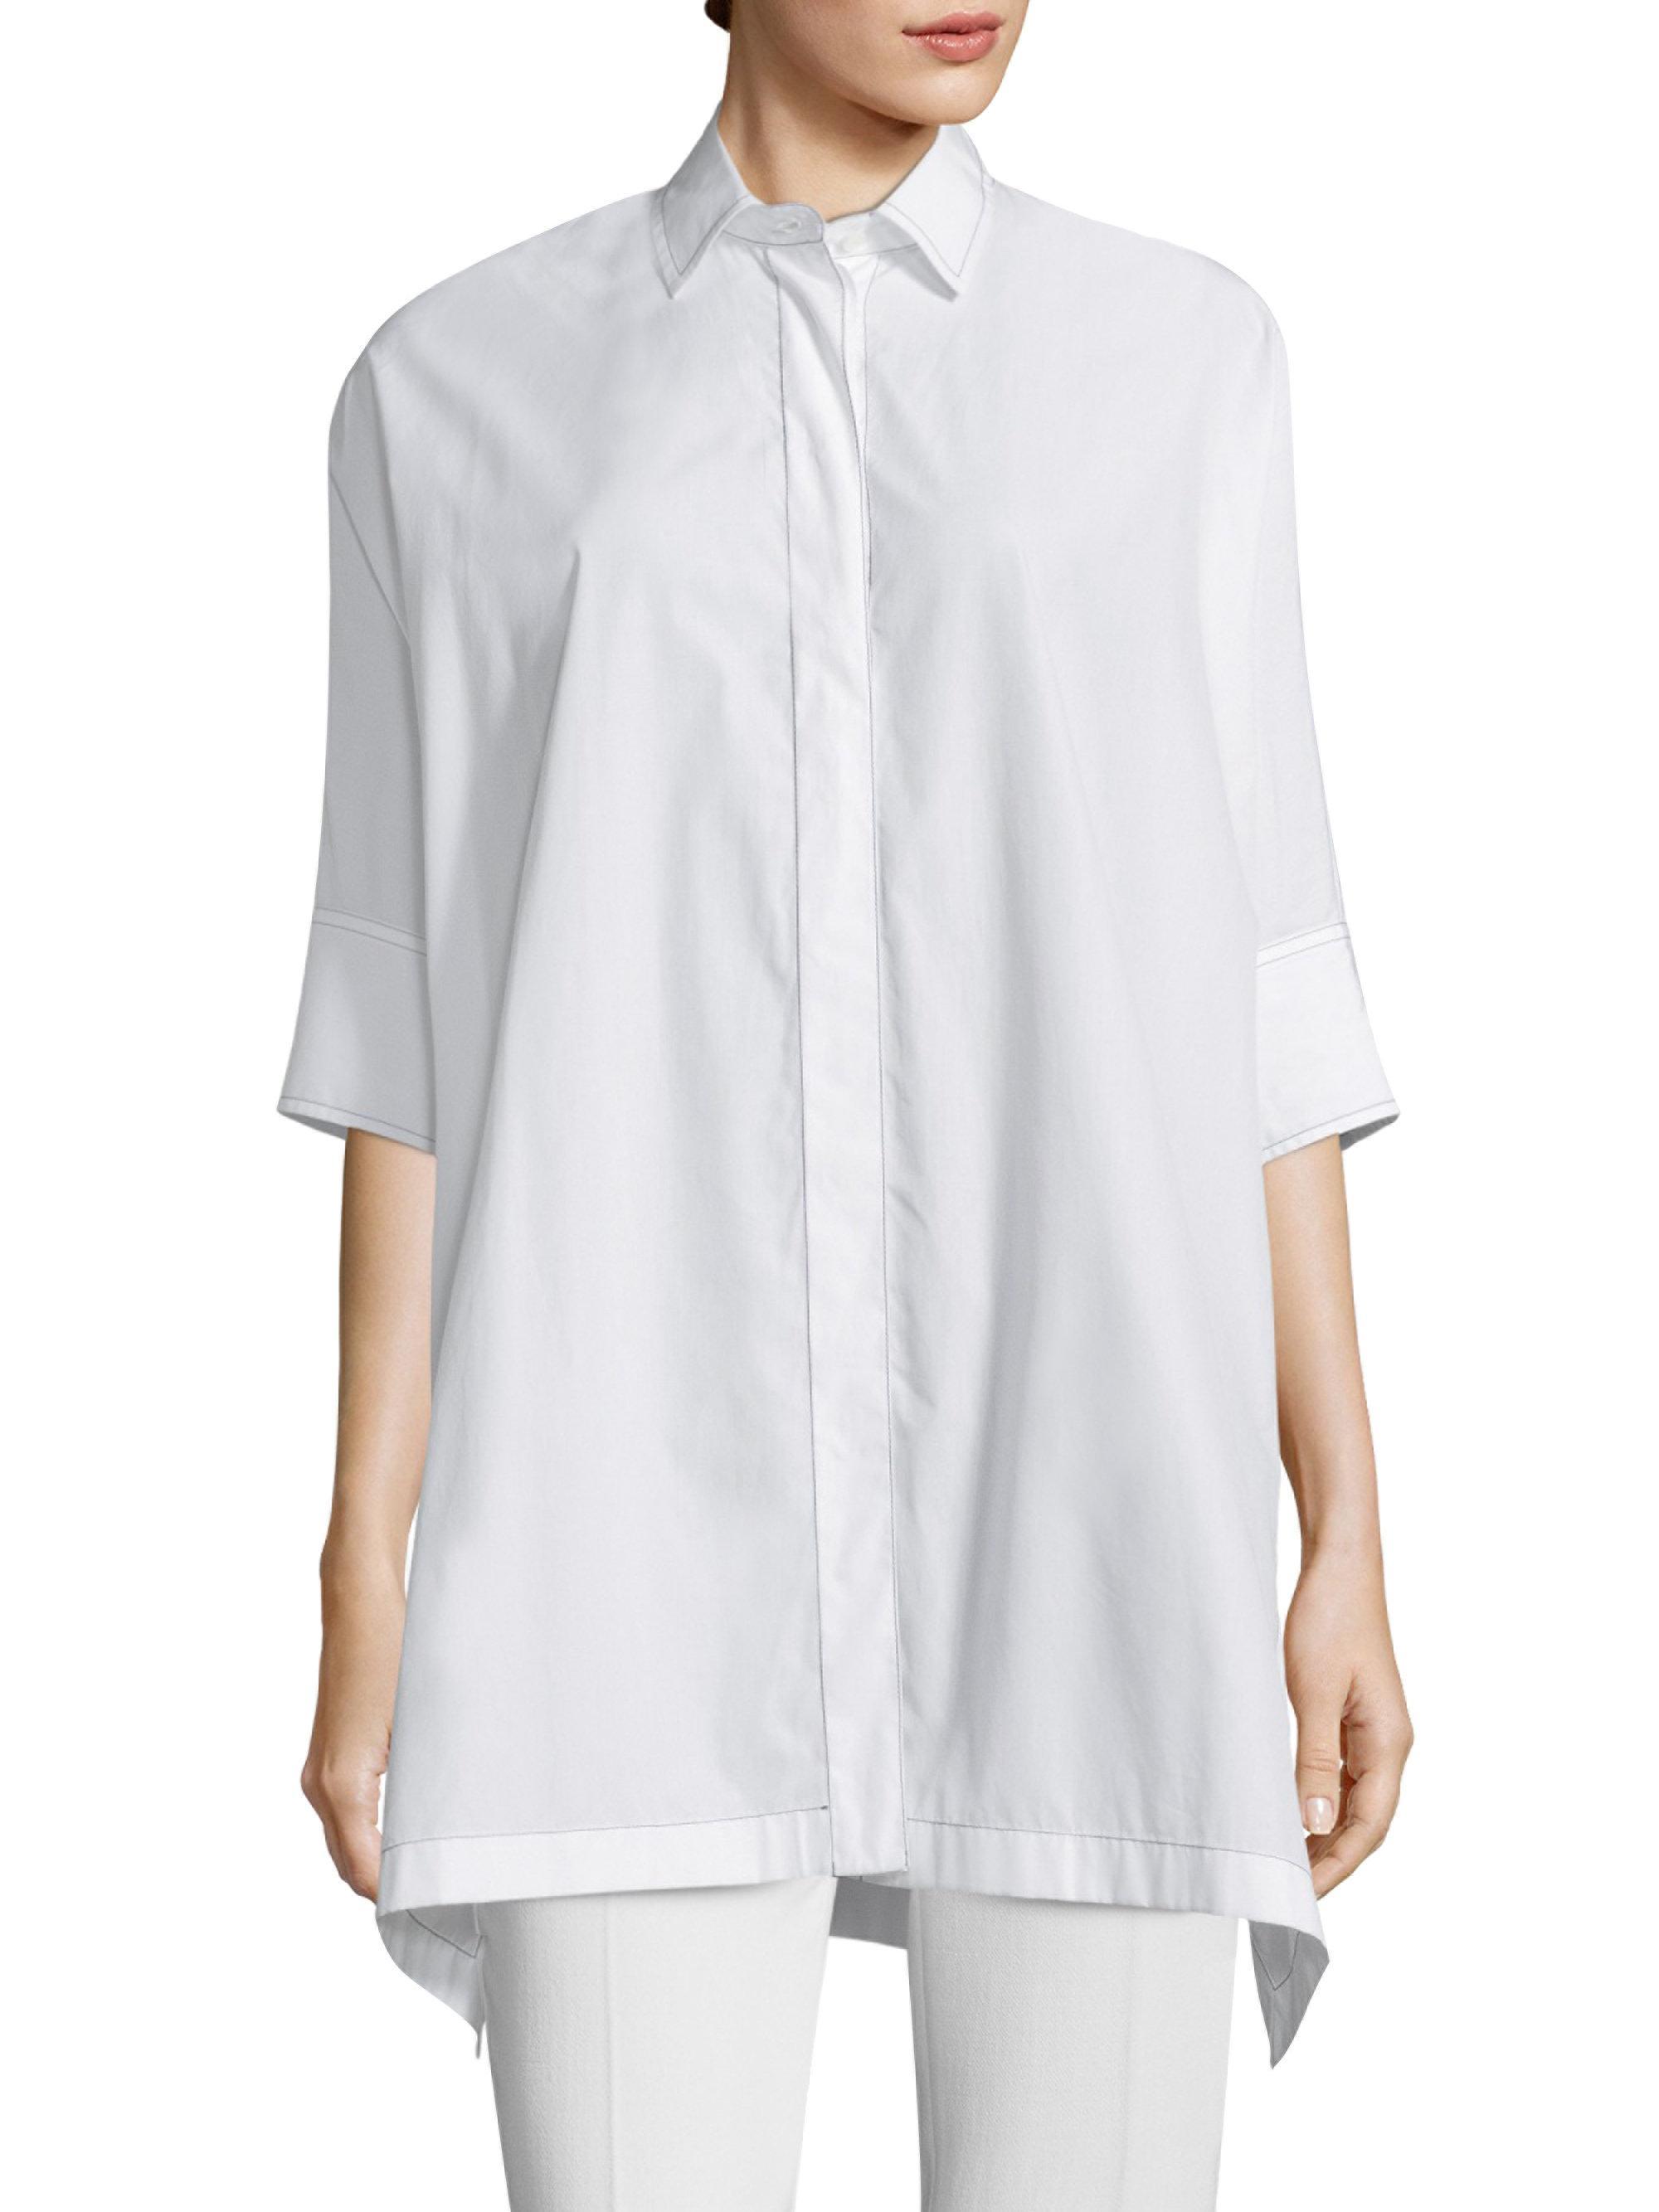 SHIRTS - Shirts Agnona Free Shipping Many Kinds Of Cheap Cheap Online ostsf